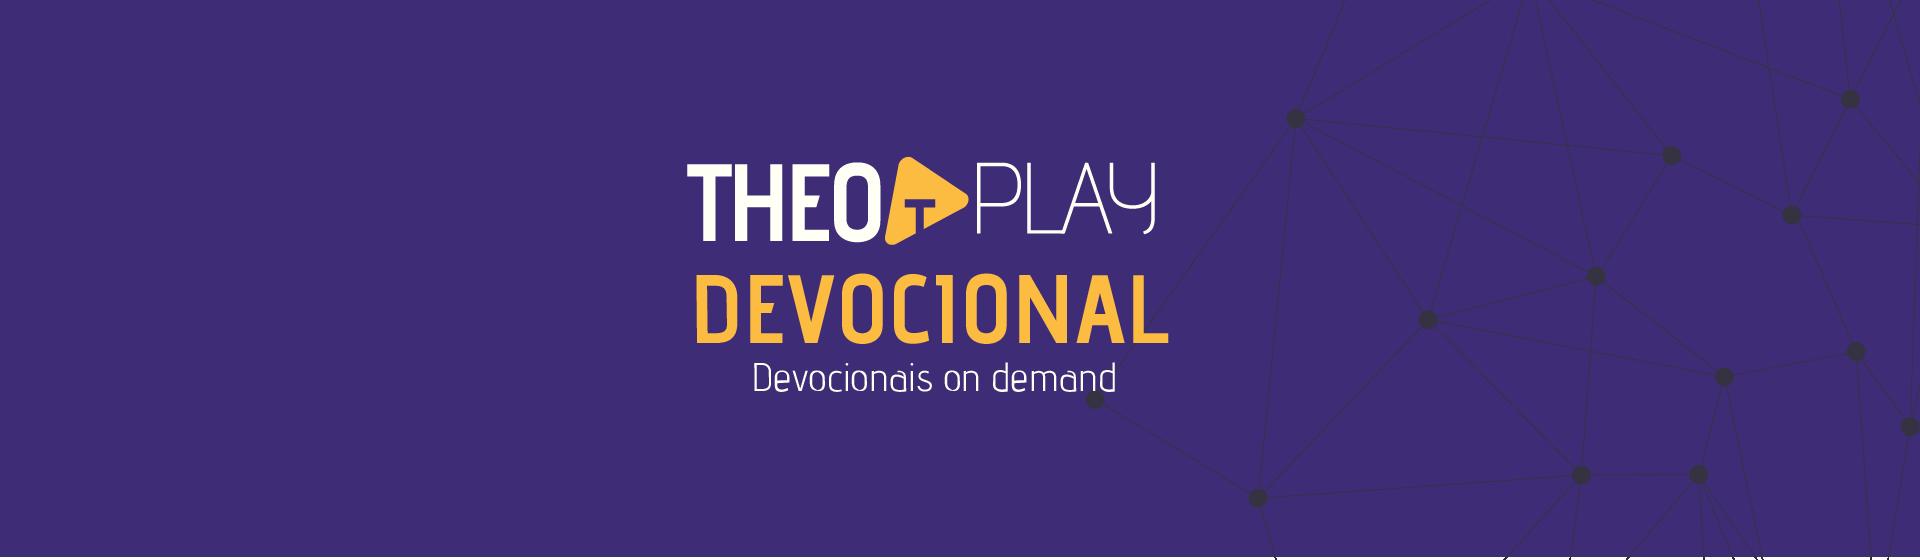 Theo devocional banner 01